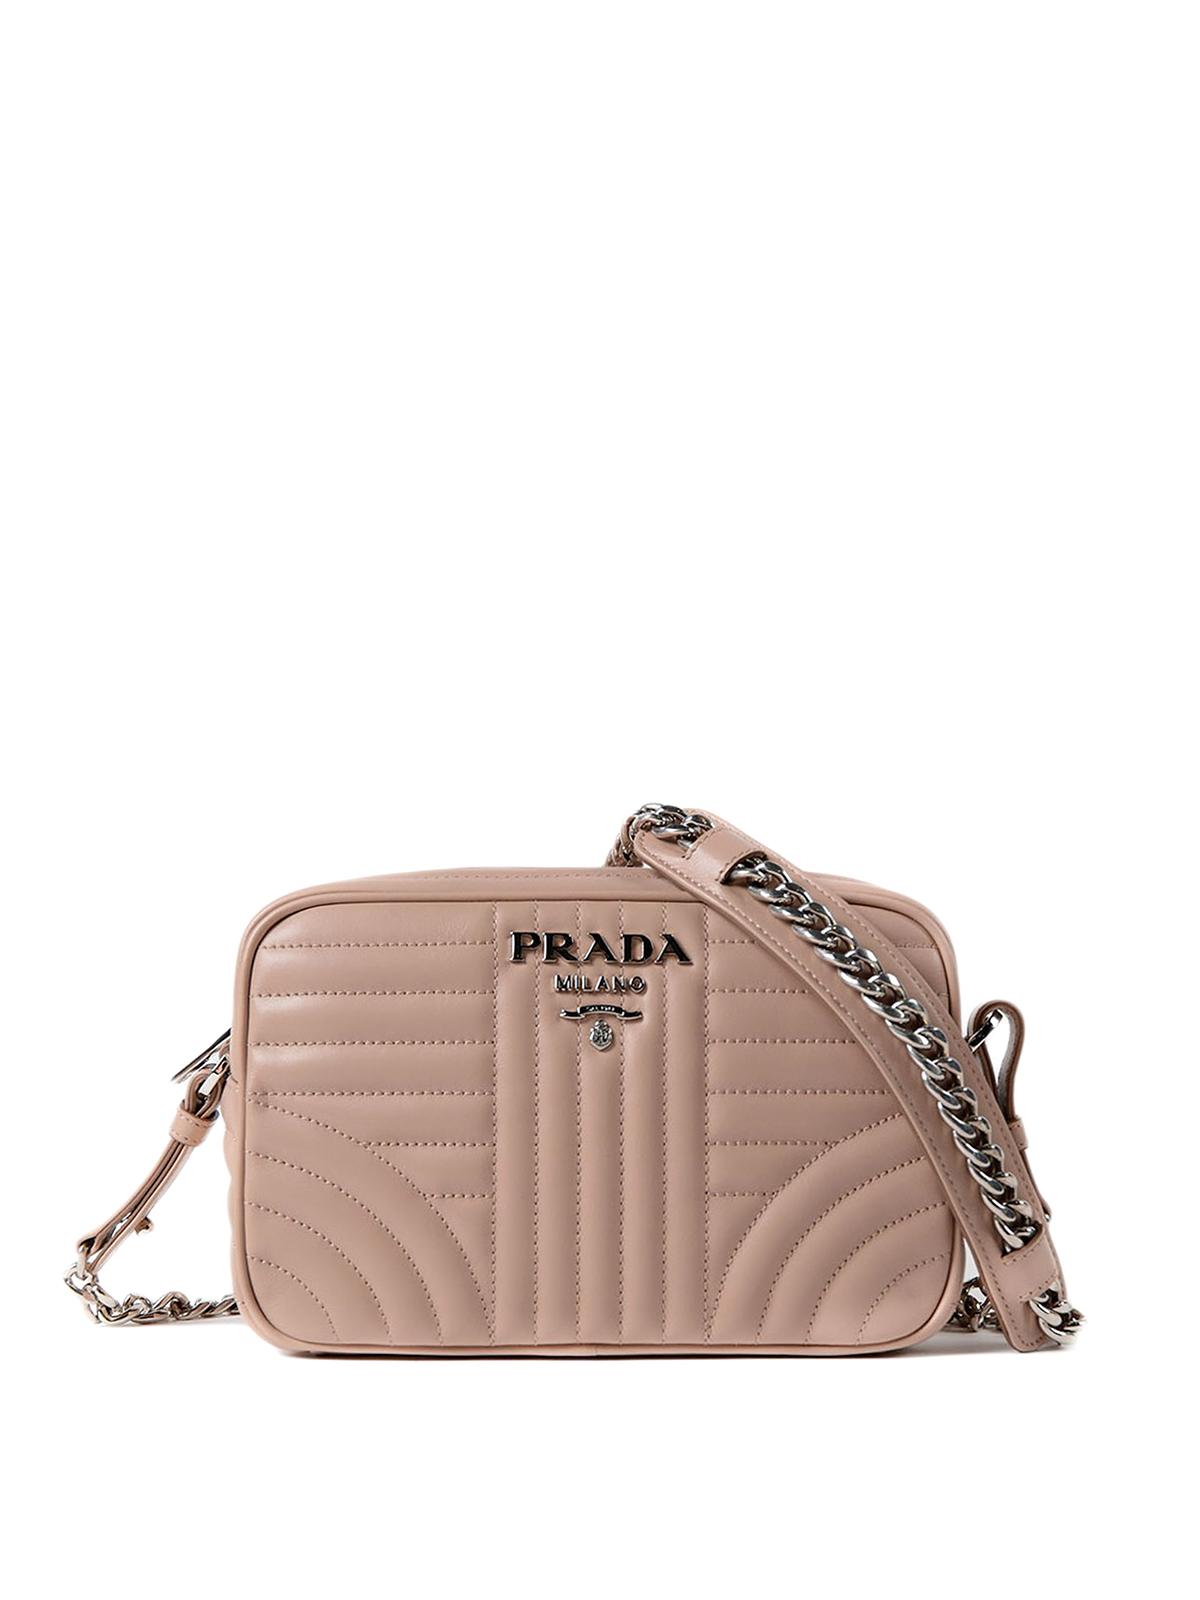 8152f44fbc37 Prada - Diagramme leather bag - cross body bags - 1BH0832D91VCOI236